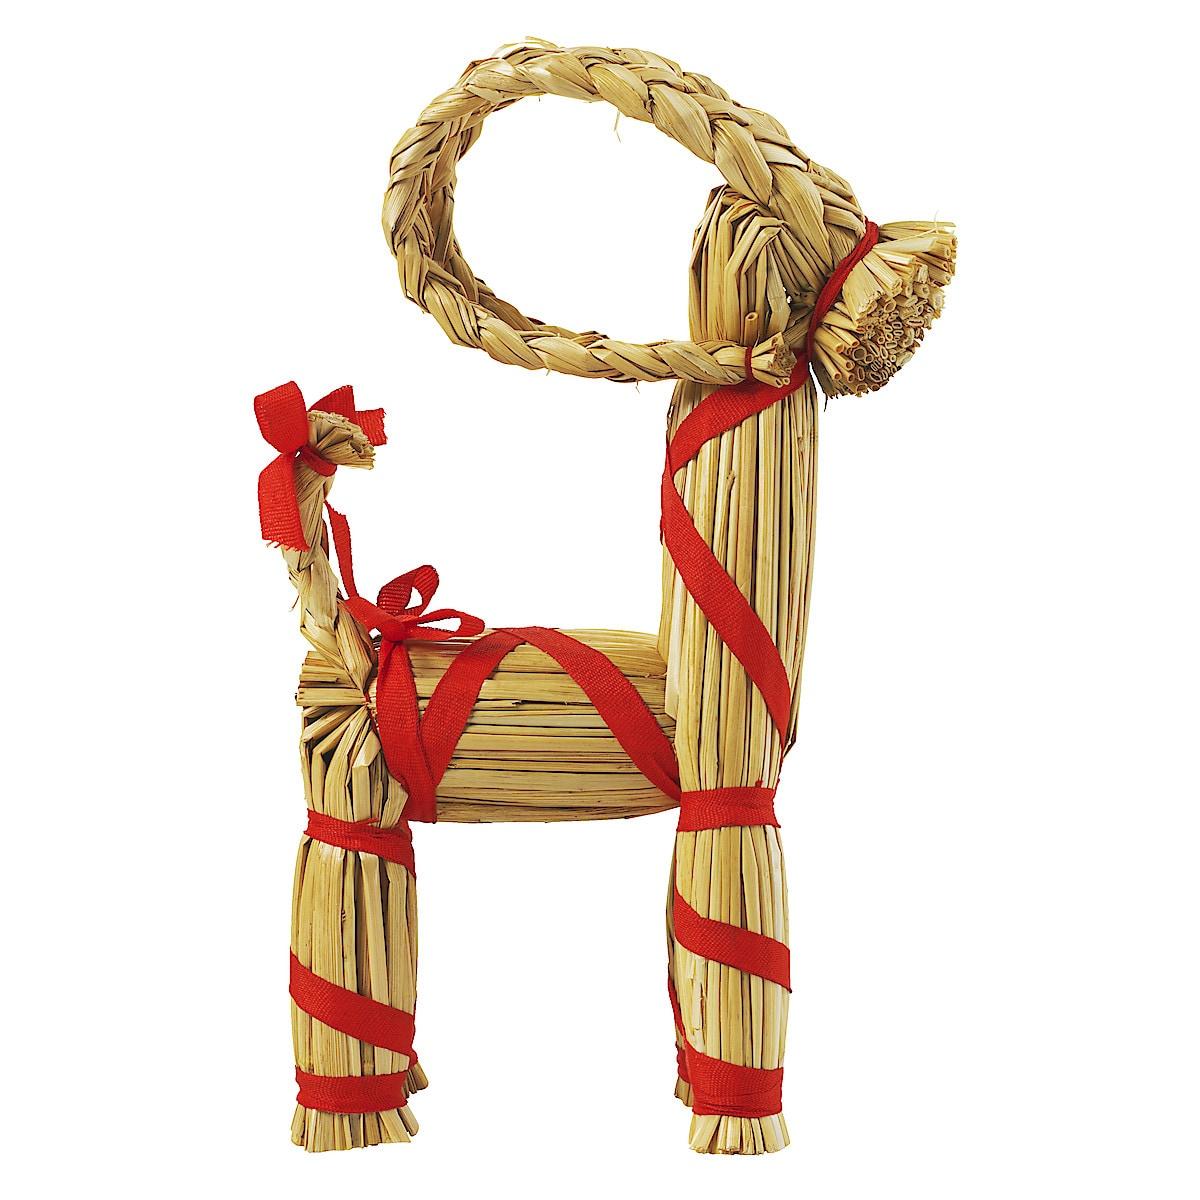 Straw Goat, 20 cm